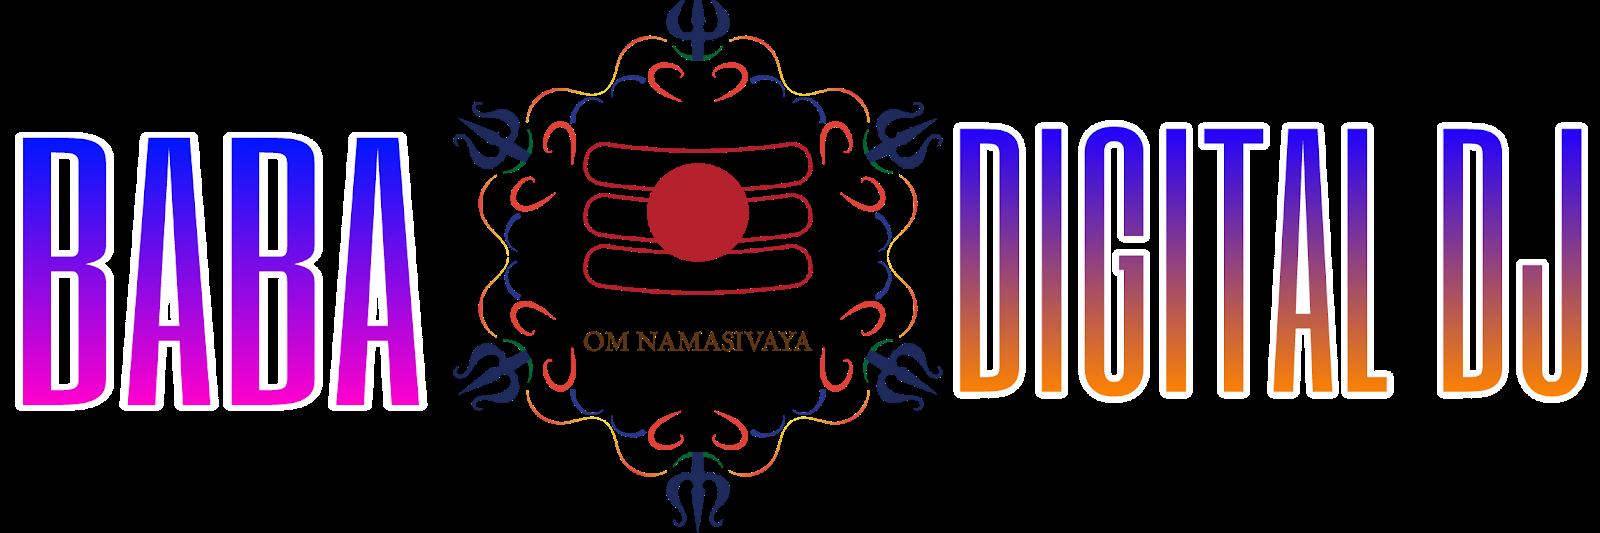 Dj Baba Blogspot 2018